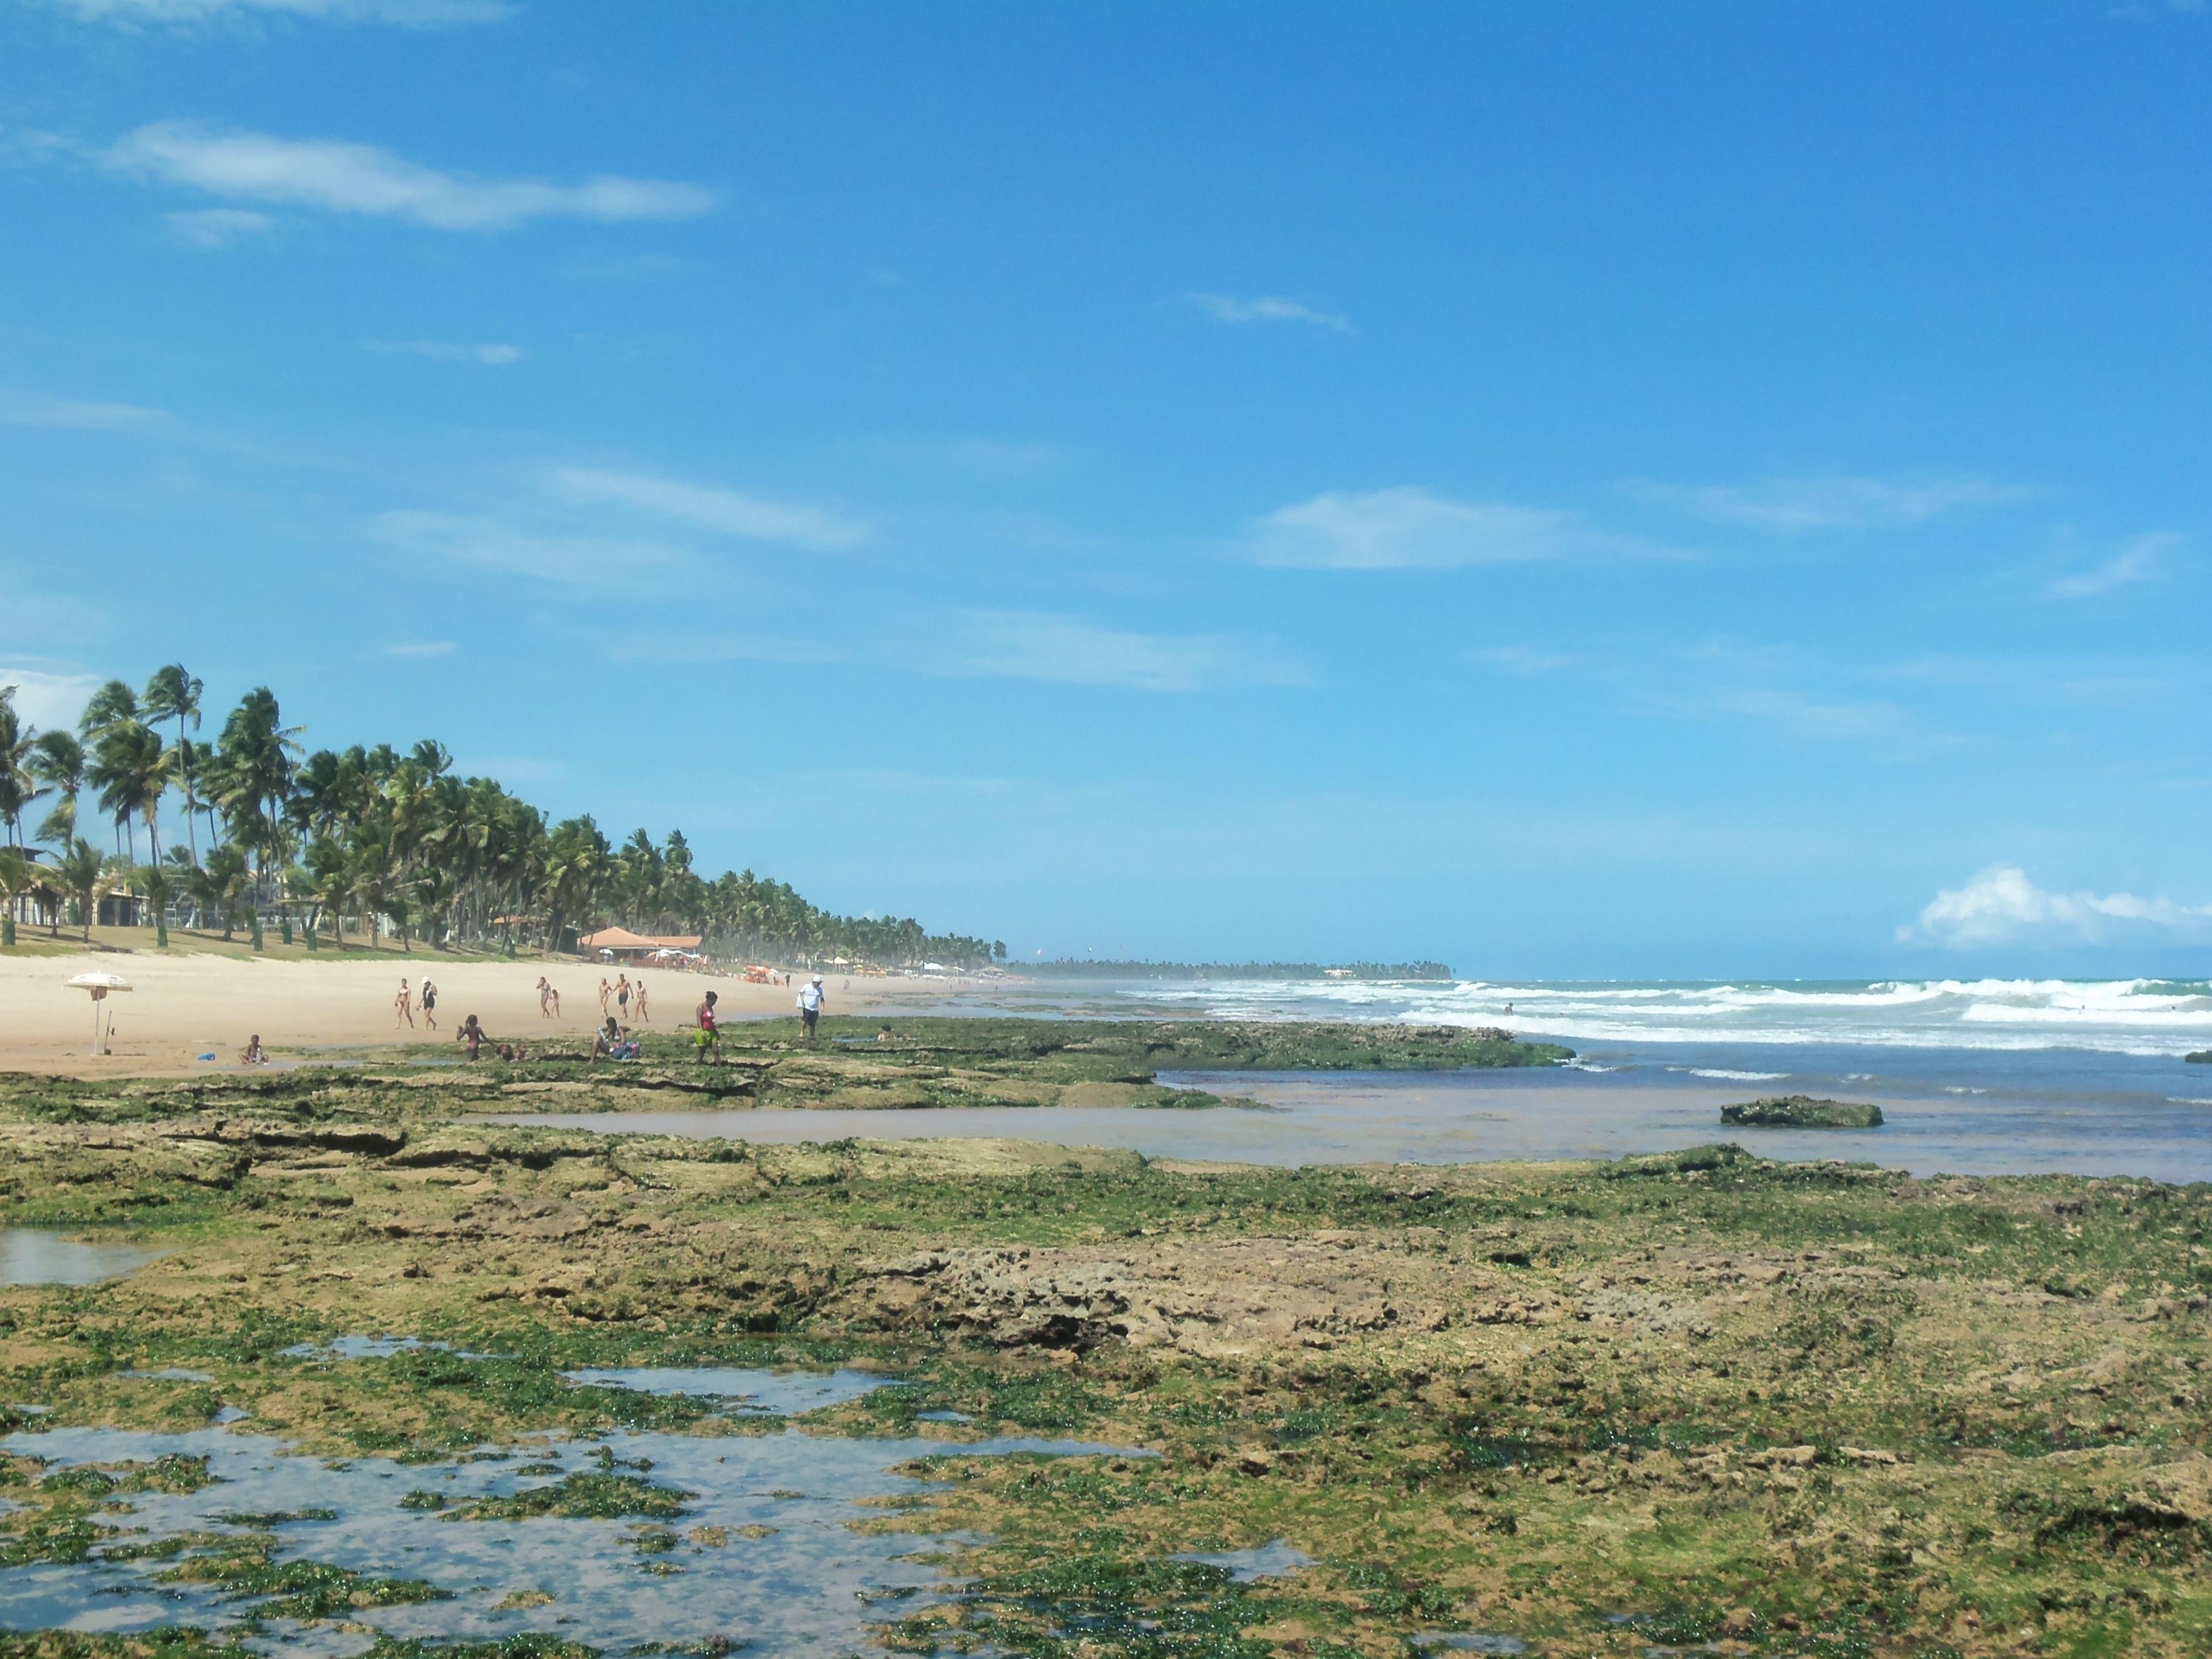 Lauro de Freitas, Bahia State, Brazil